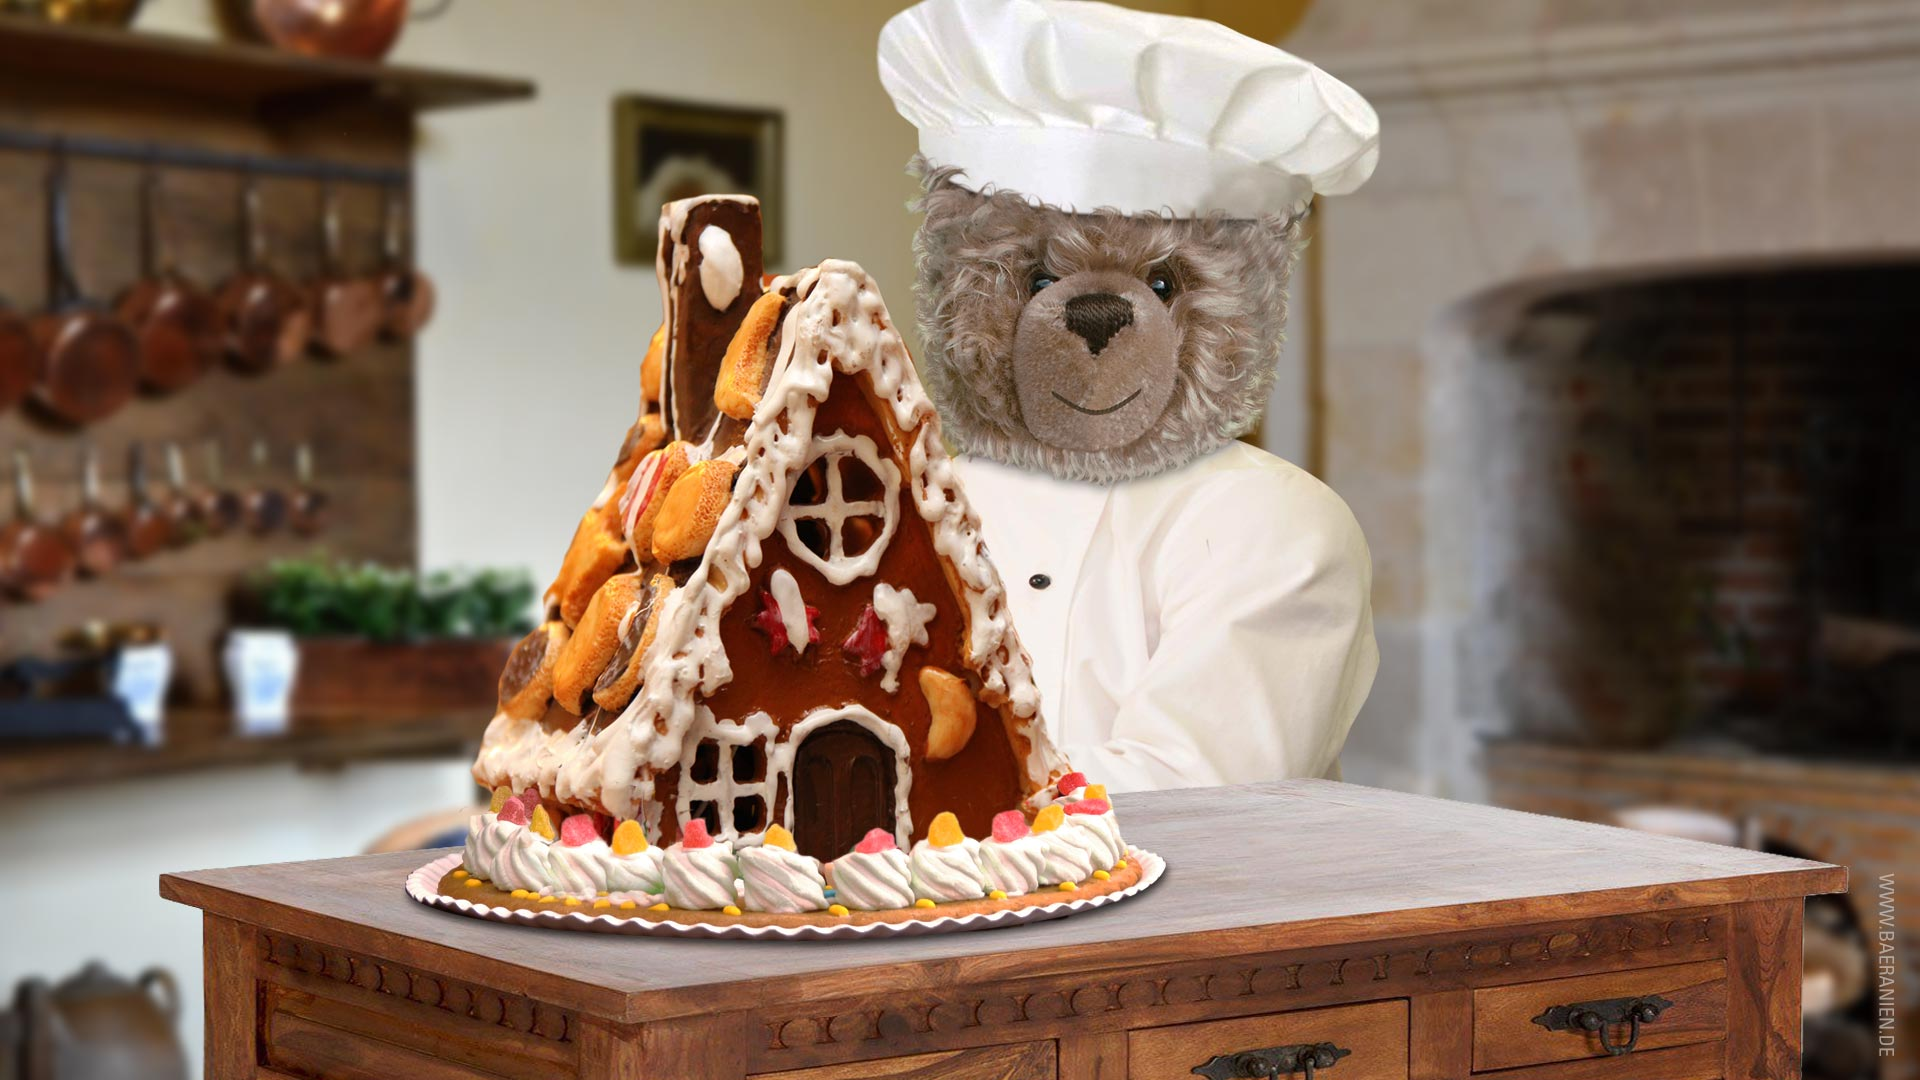 Teddy-König Opa feiert Lebkuchenhaus-Tag